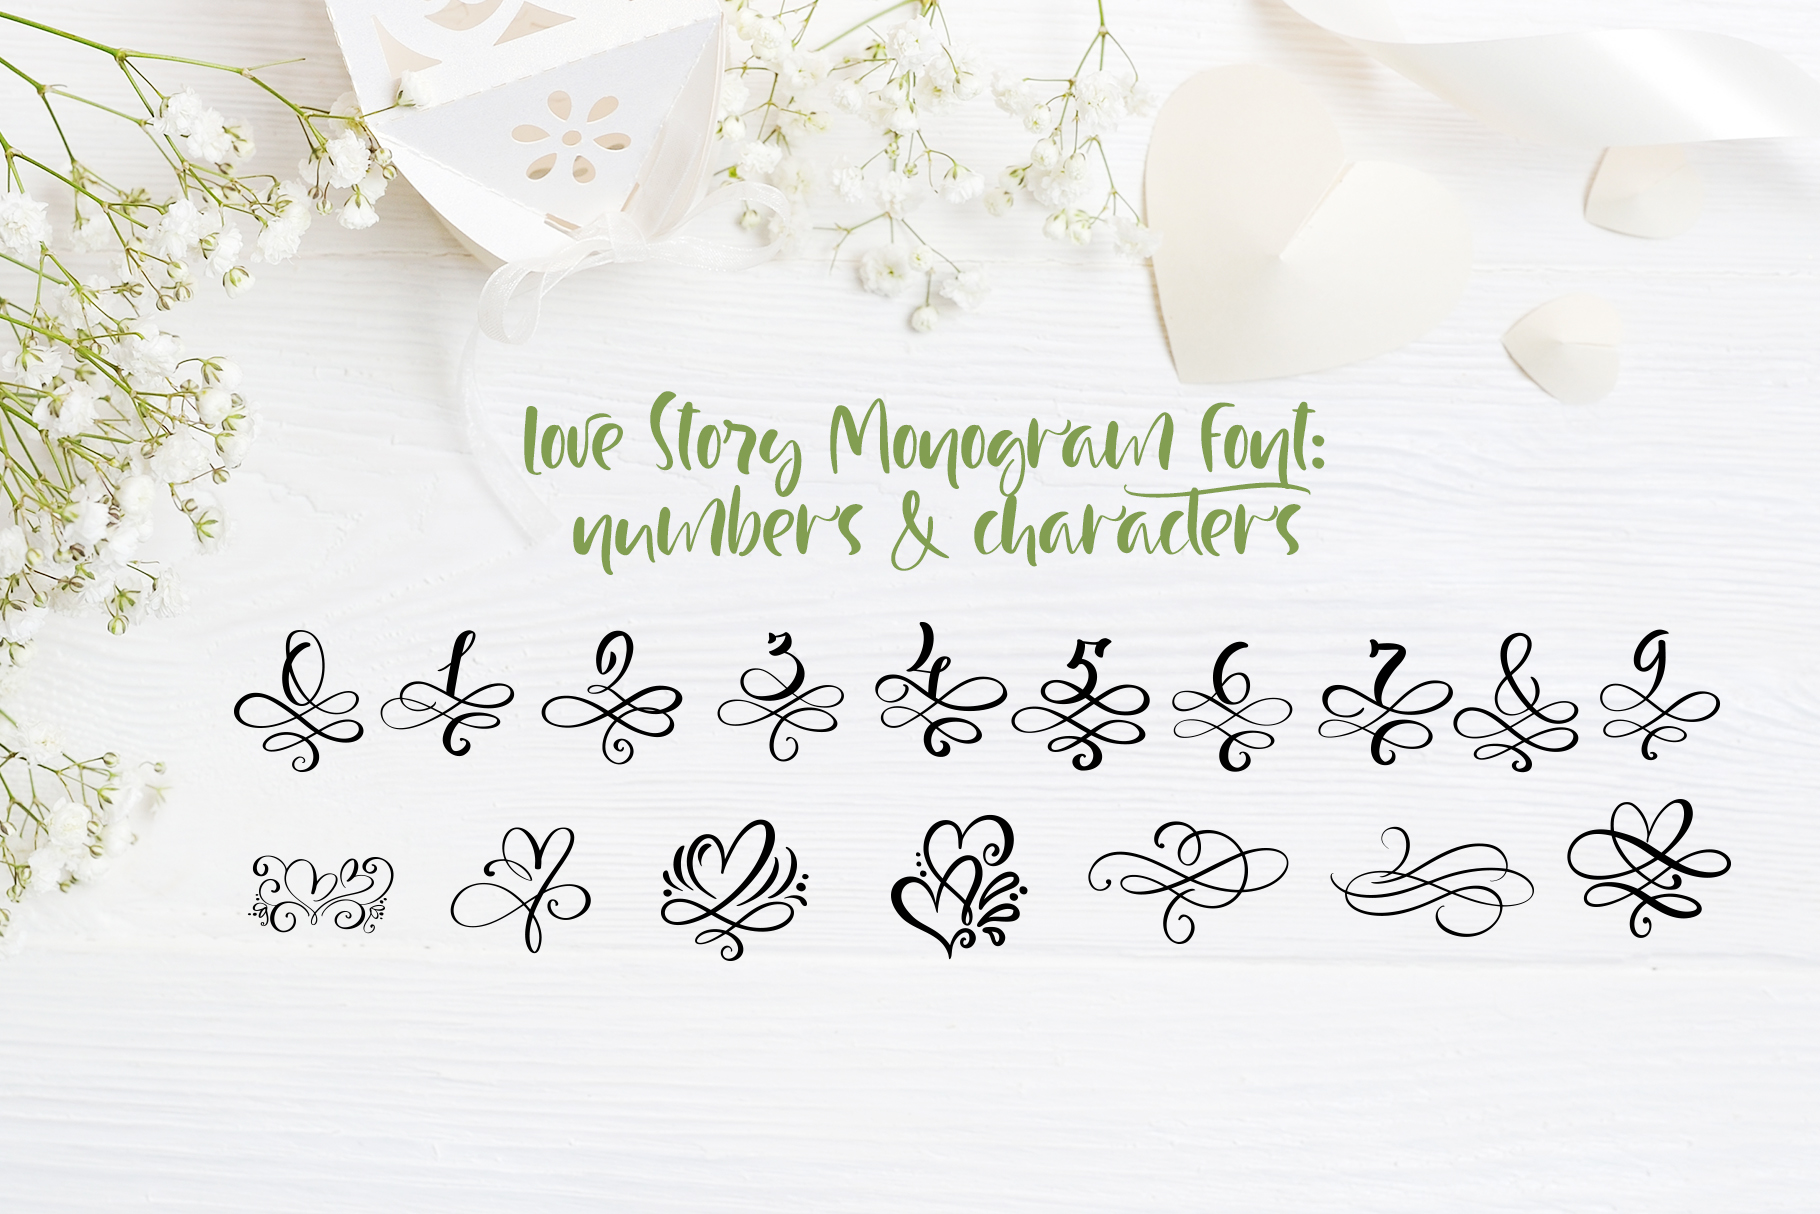 Love Story Monogram Font example image 7